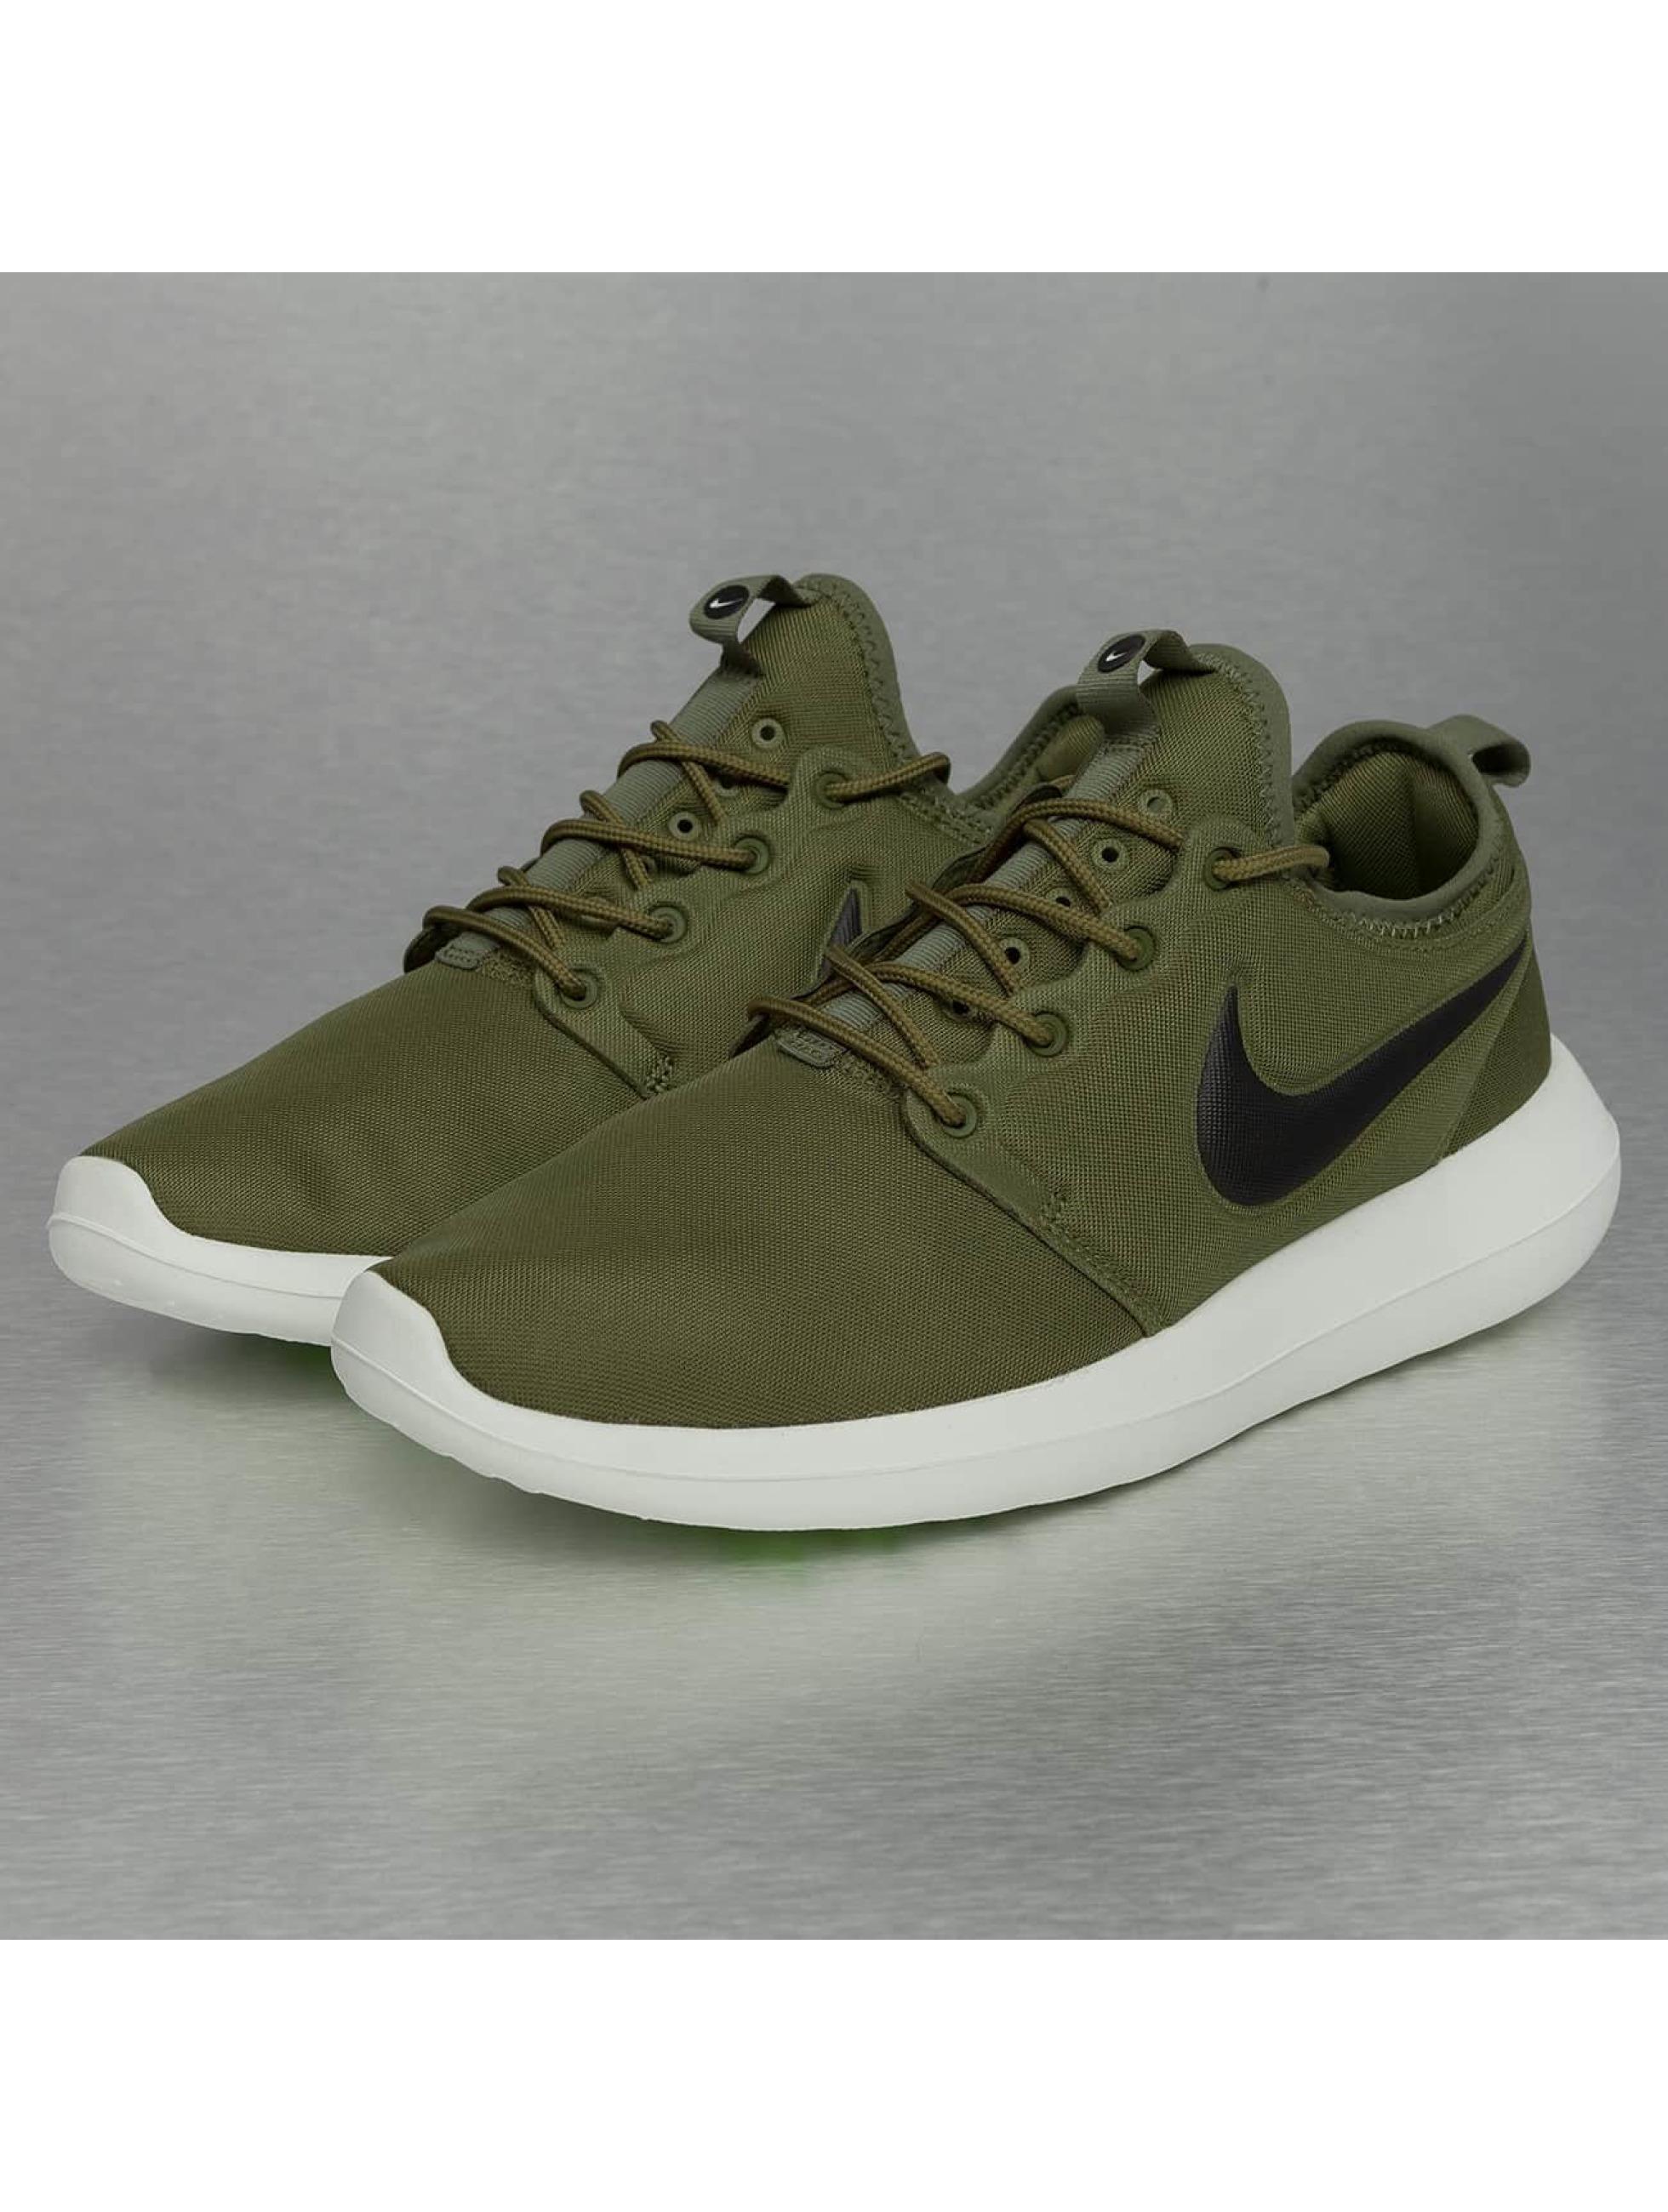 sale retailer a3e7c be205 nike roshe run liberty femme acheter. Nike Kaishi Nike Kaishi nike baskets  olive nike baskets olive